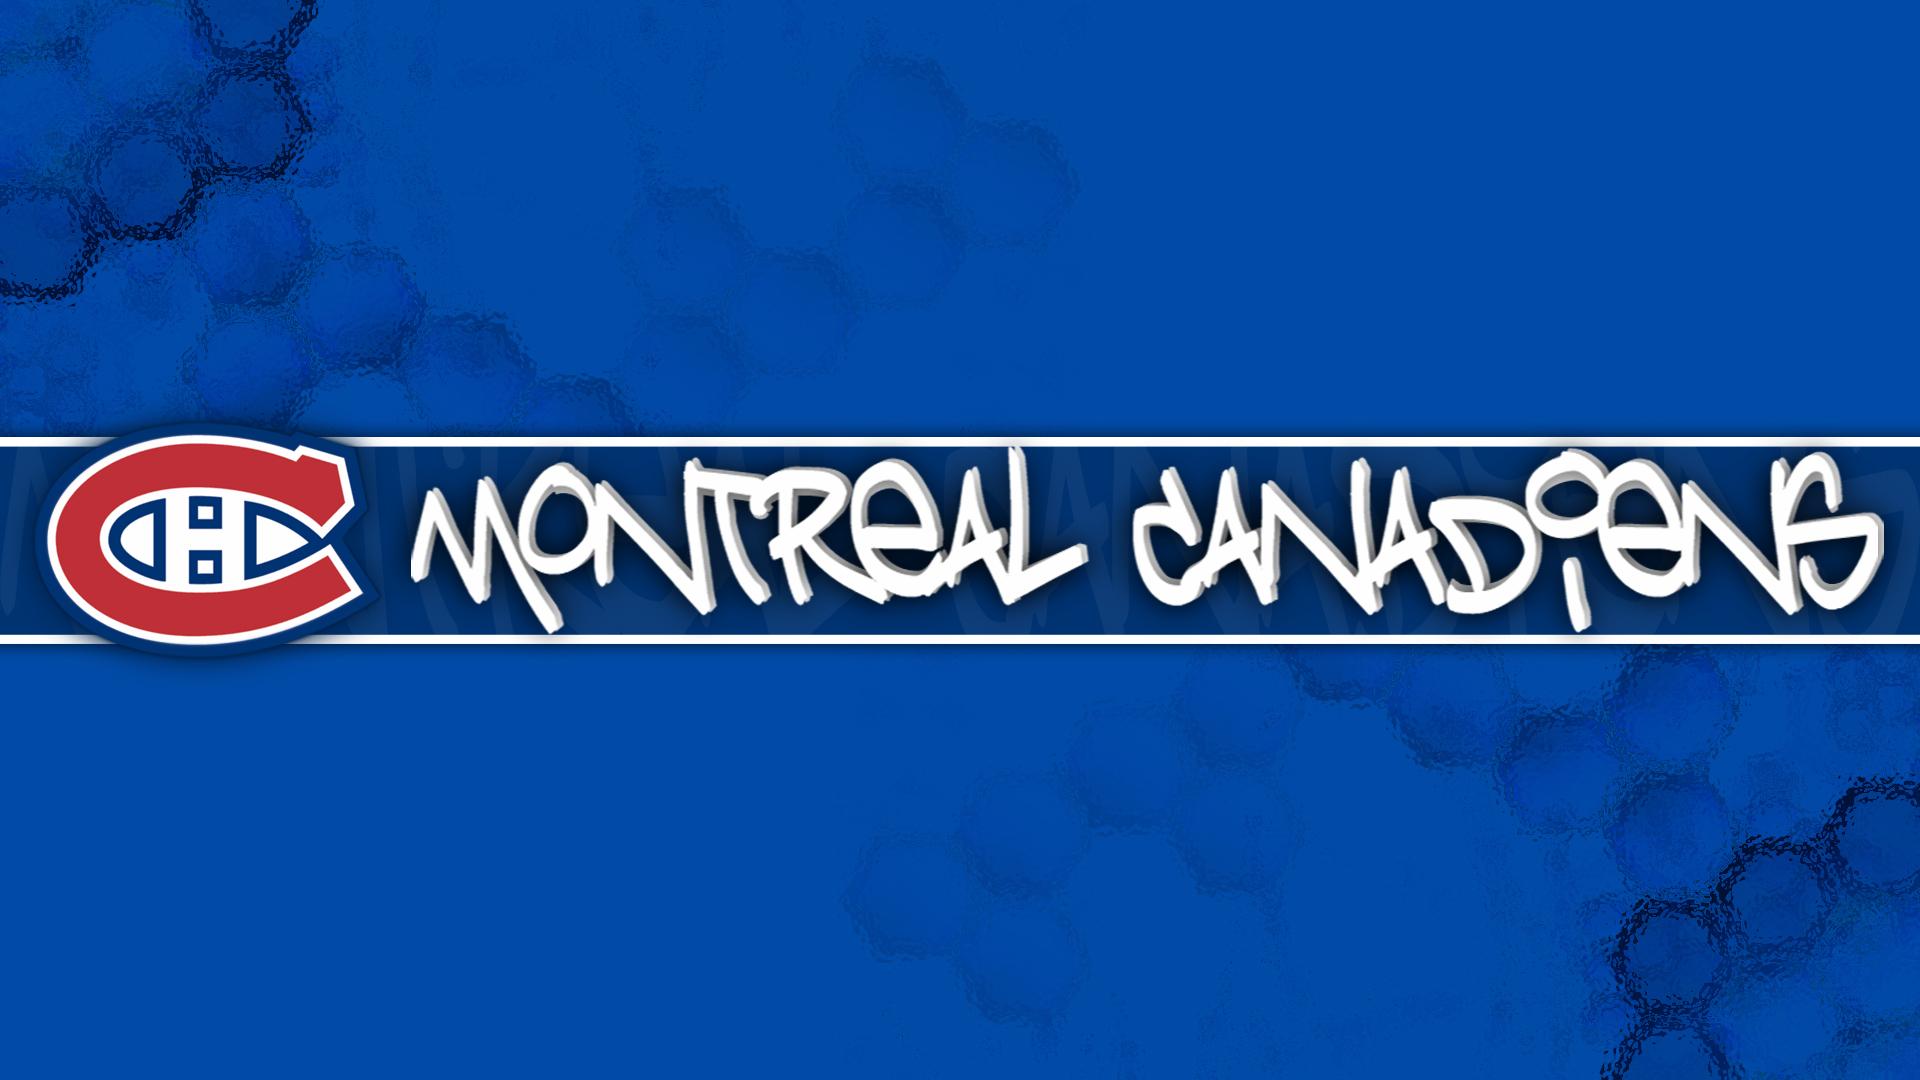 Montreal Canadiens wallpaper   ForWallpapercom 1920x1080